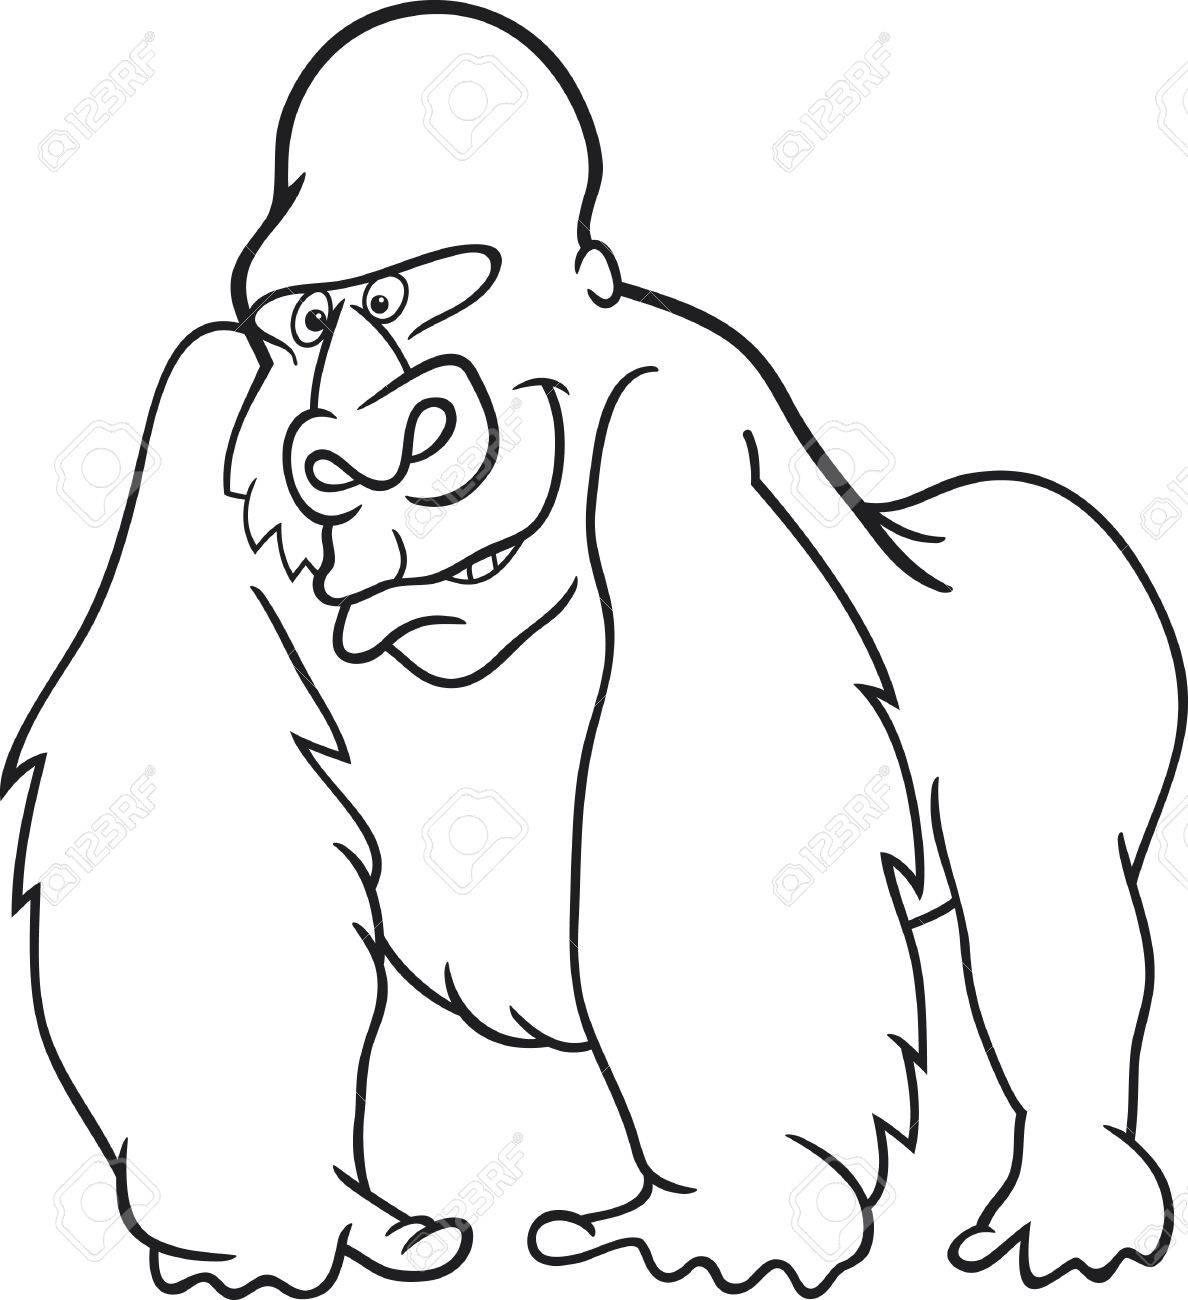 silver gorilla for coloring book royalty free cliparts, vectors ... - Silverback Gorilla Coloring Pages